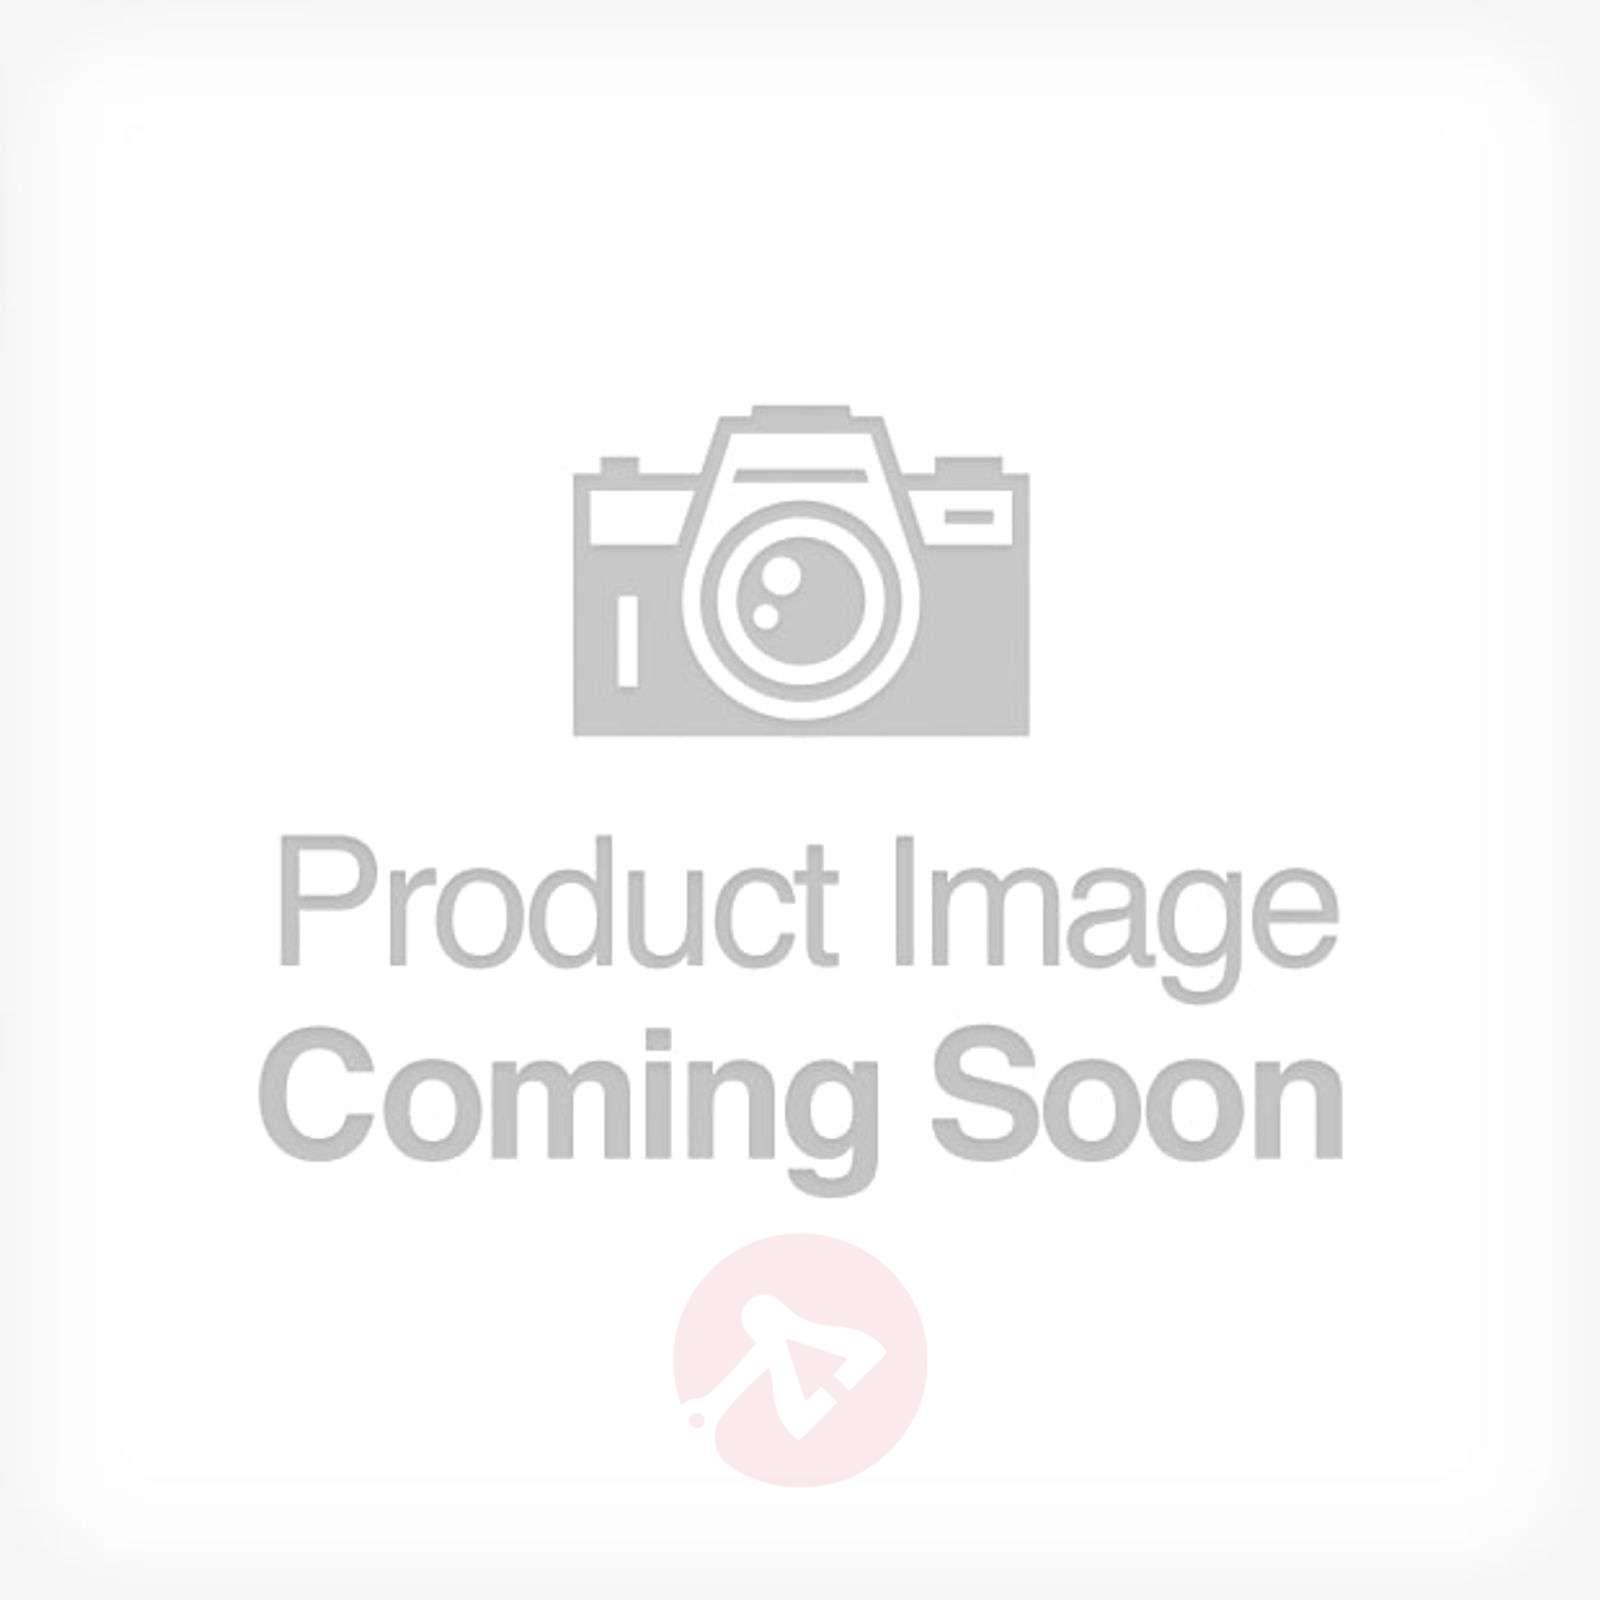 Taketa Wall Light Modern-1020004-03